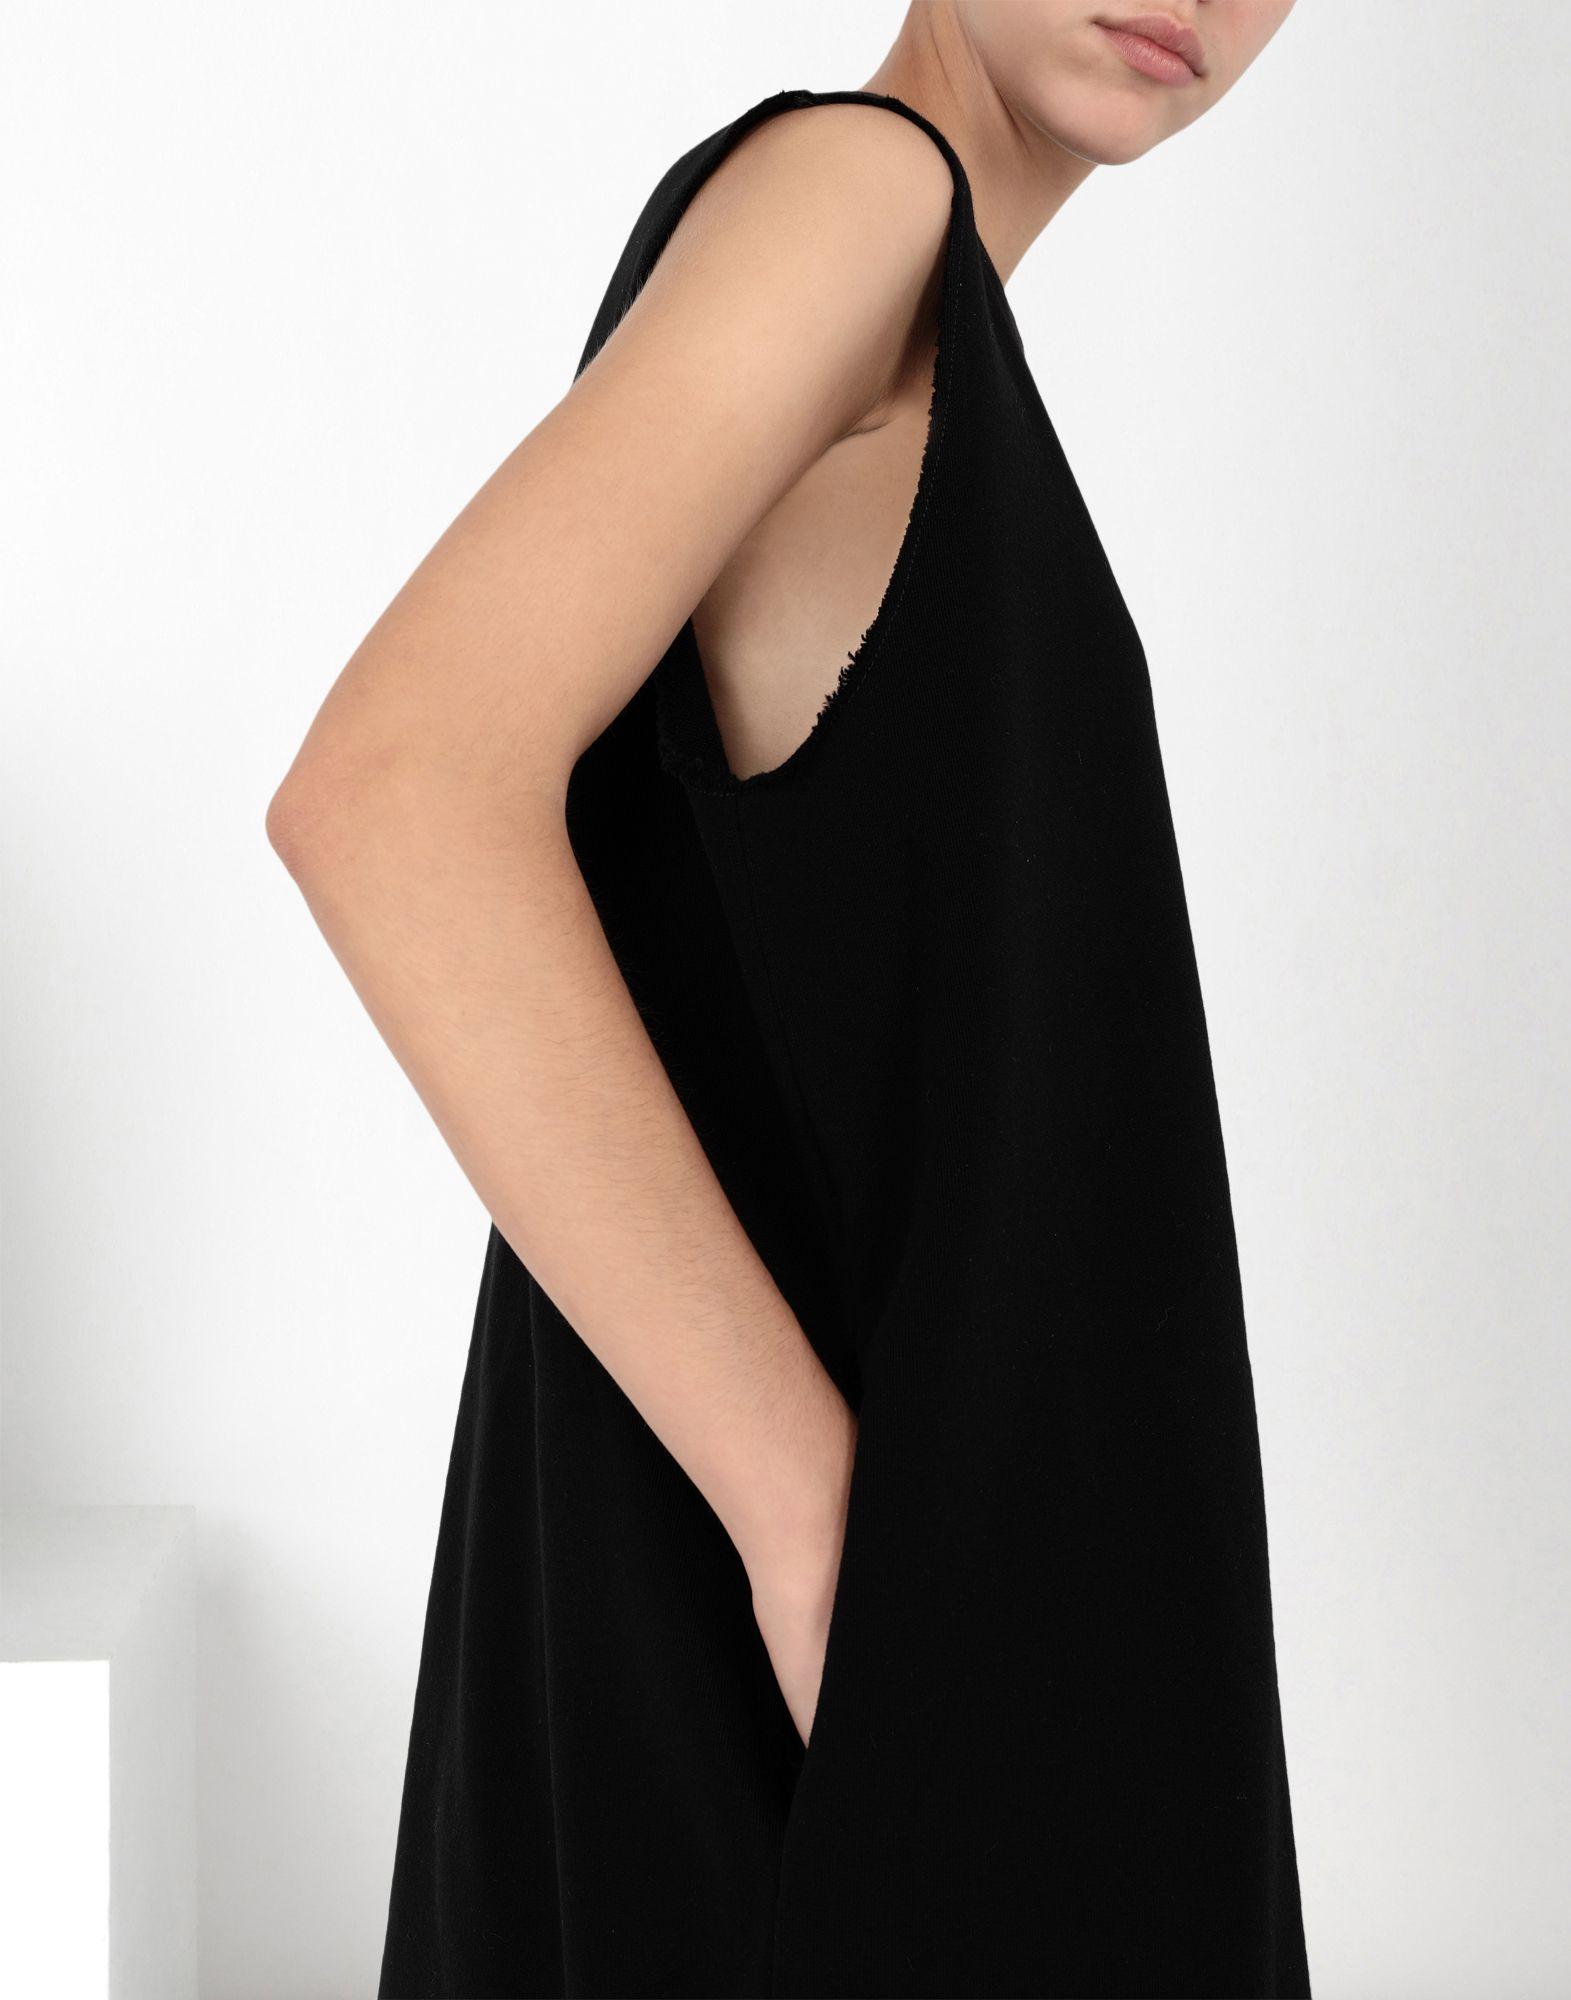 MM6 MAISON MARGIELA Jumper dress with fringes Long dress Woman e